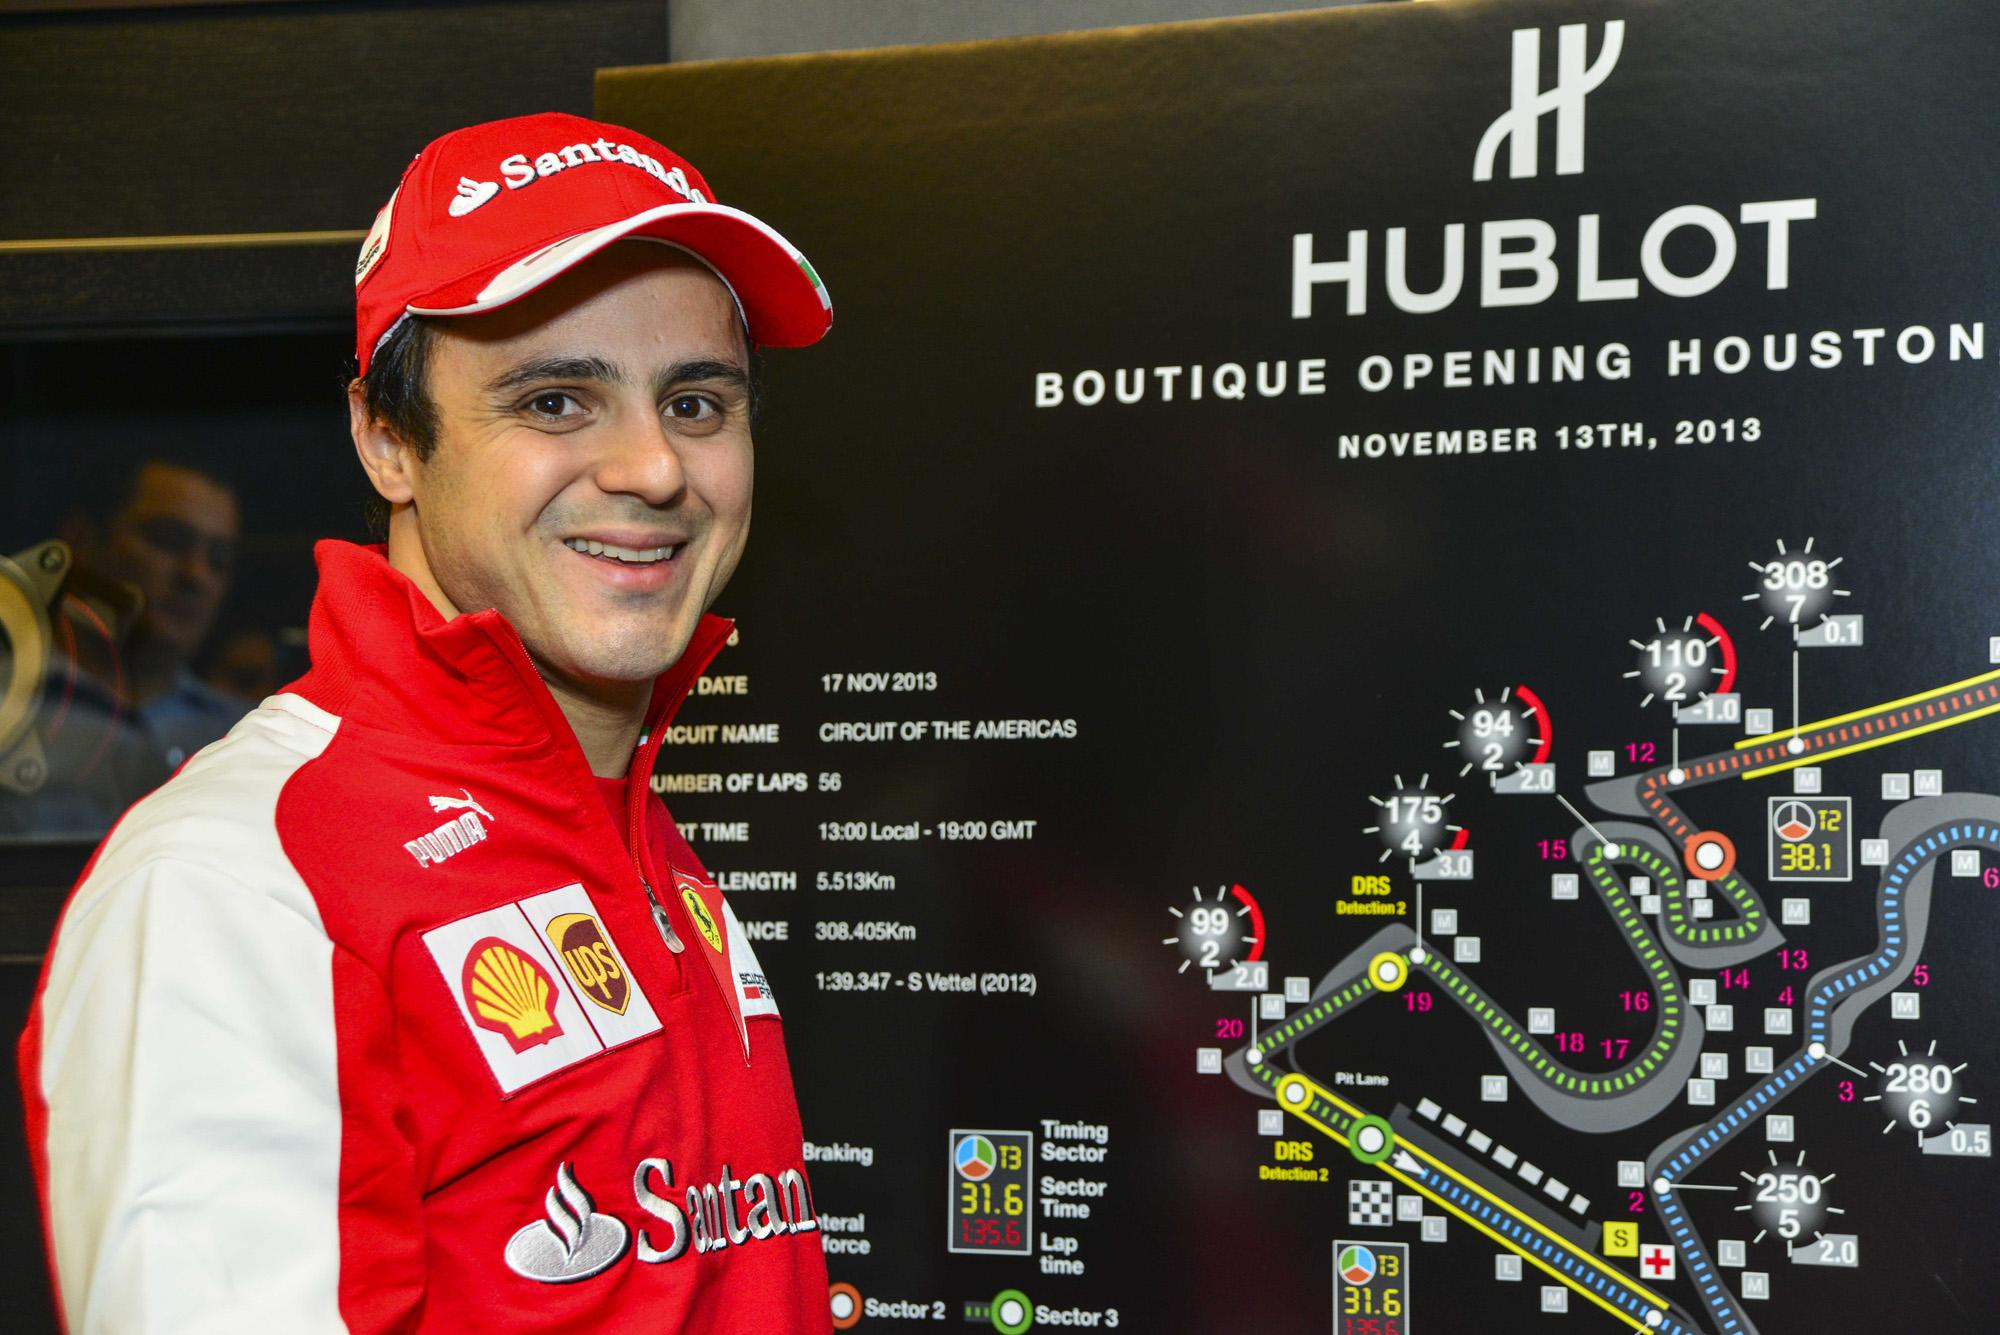 Hublot Houston Galleria Grand Opening with Formula 1 Driver Felipe Massa